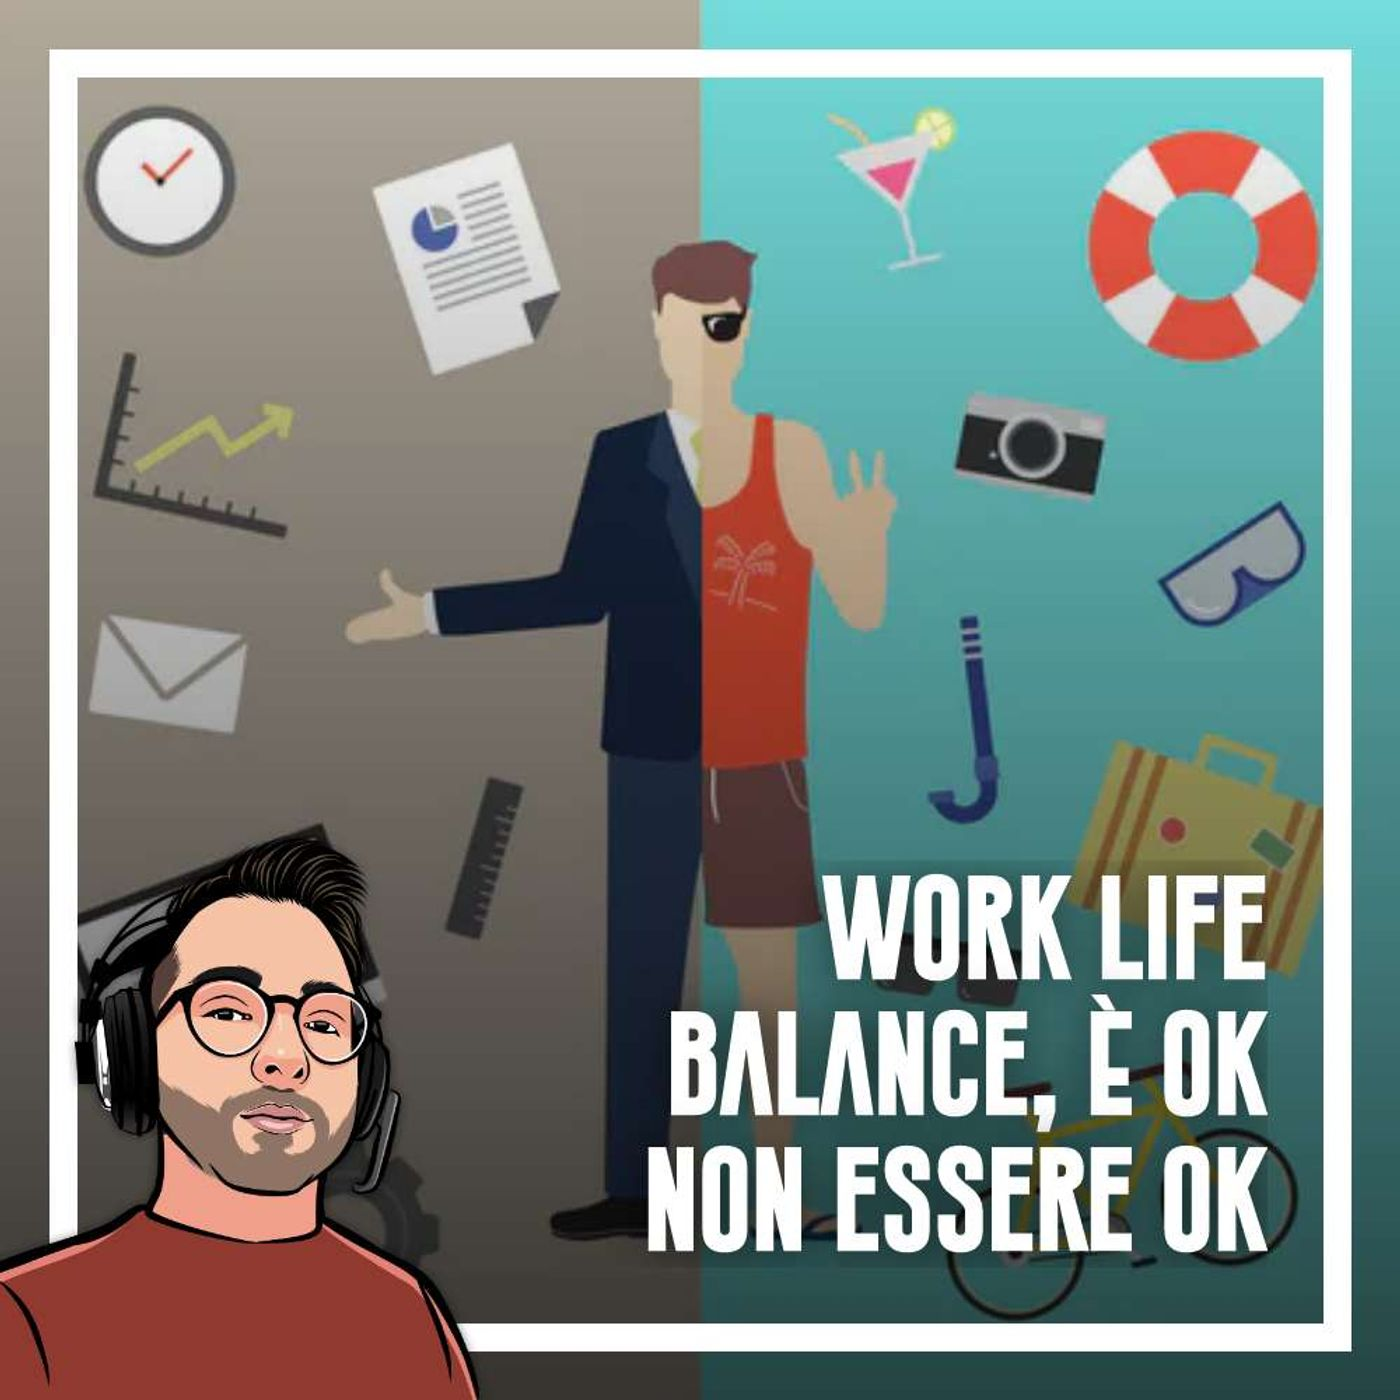 Ep.68 - WorkLife balance, è ok non essere ok